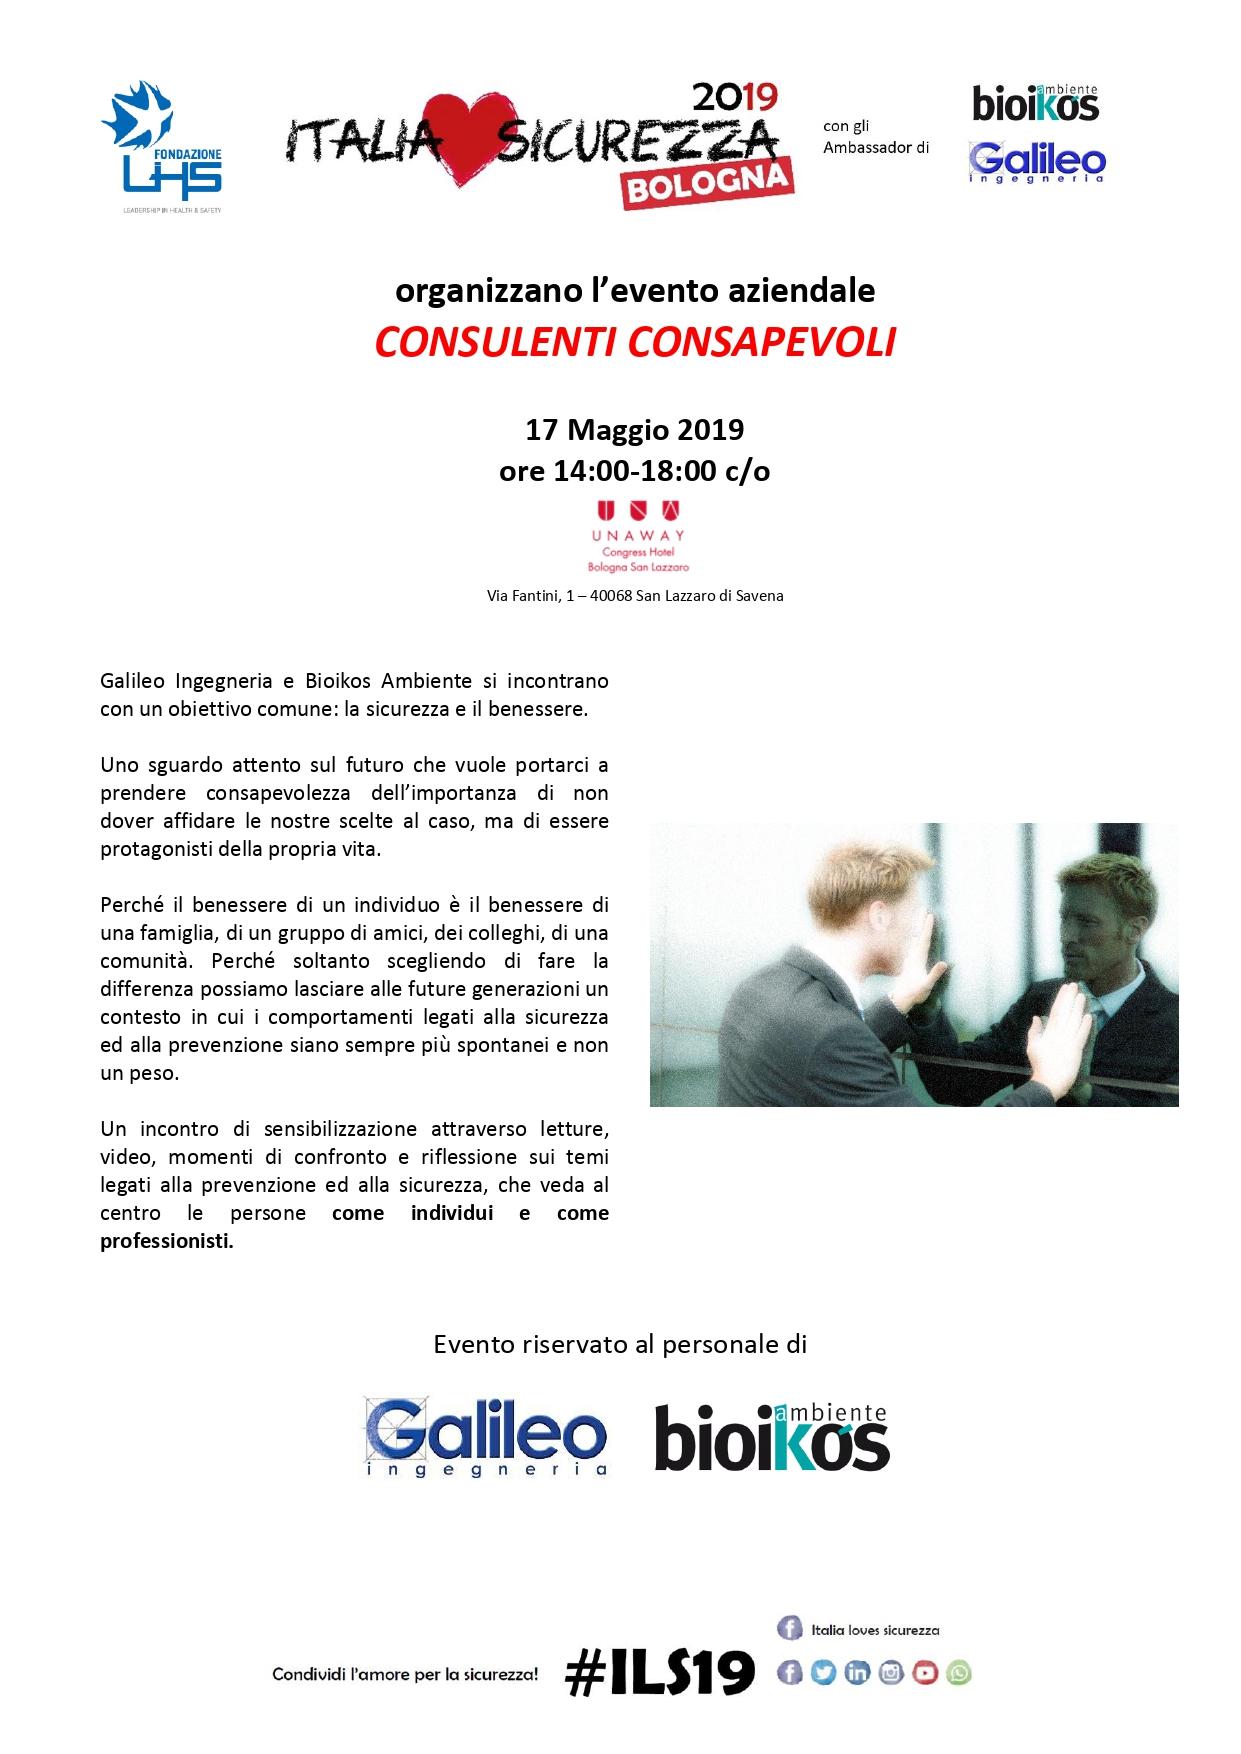 http://www.fondlhs.org/wp-content/uploads/2019/05/ILS-Consulenti-Consapevoli.jpg